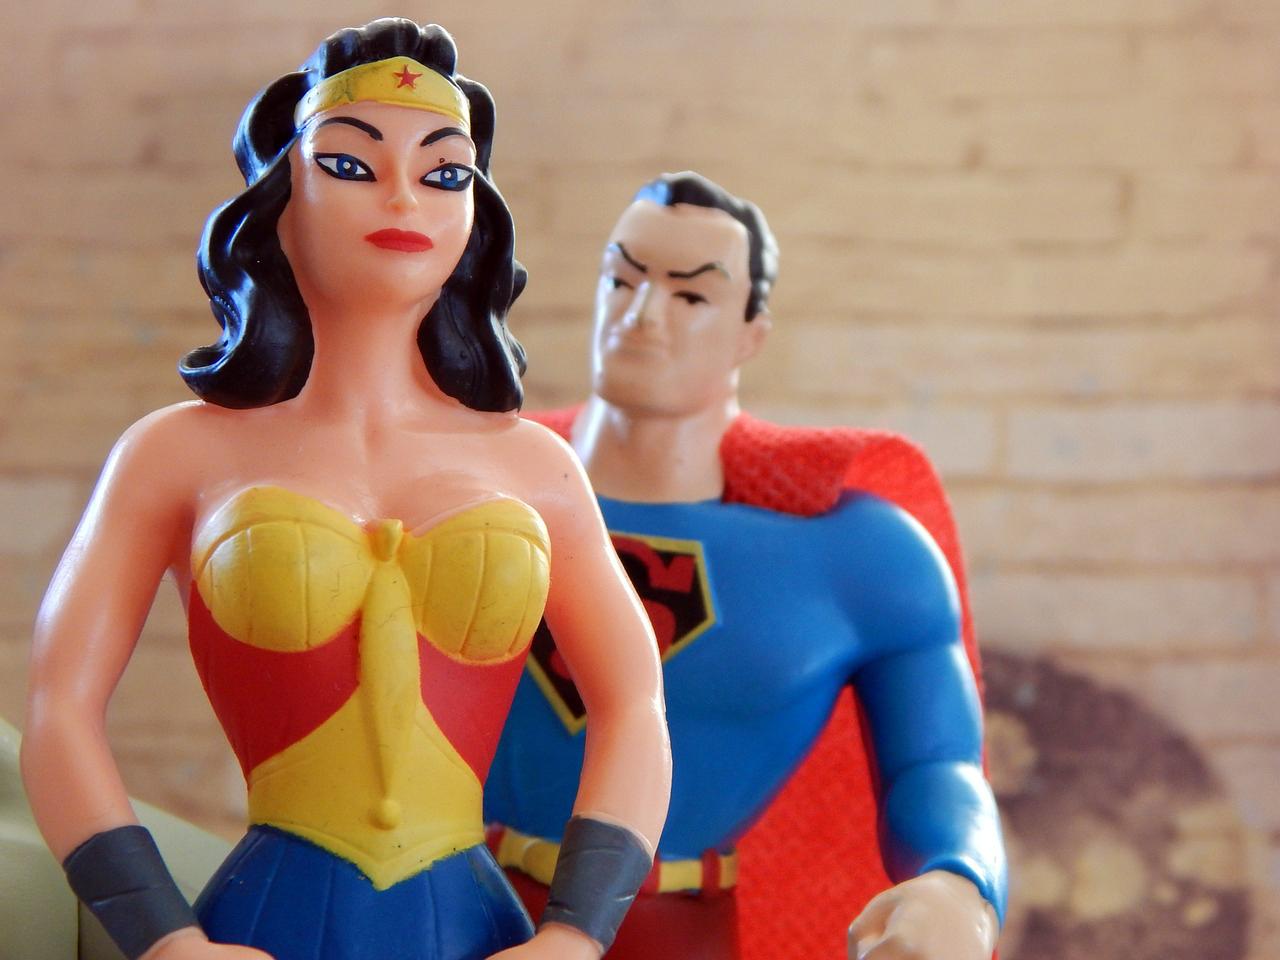 Attraktiv androgyne frauen tinispeucon: Dunkle